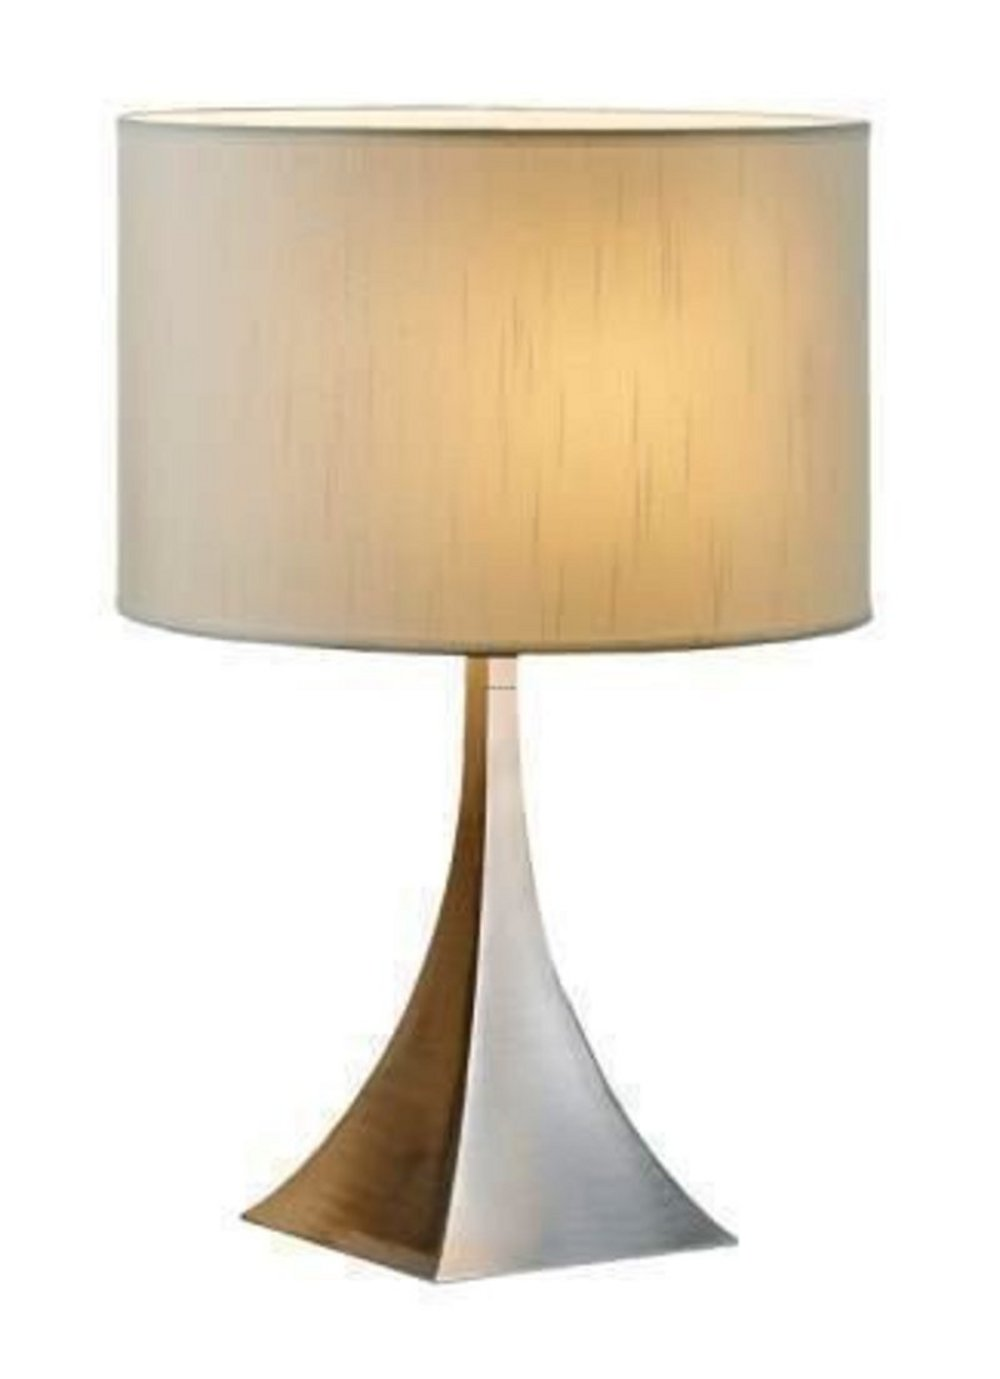 Unique Rectangular Base Table Lamp